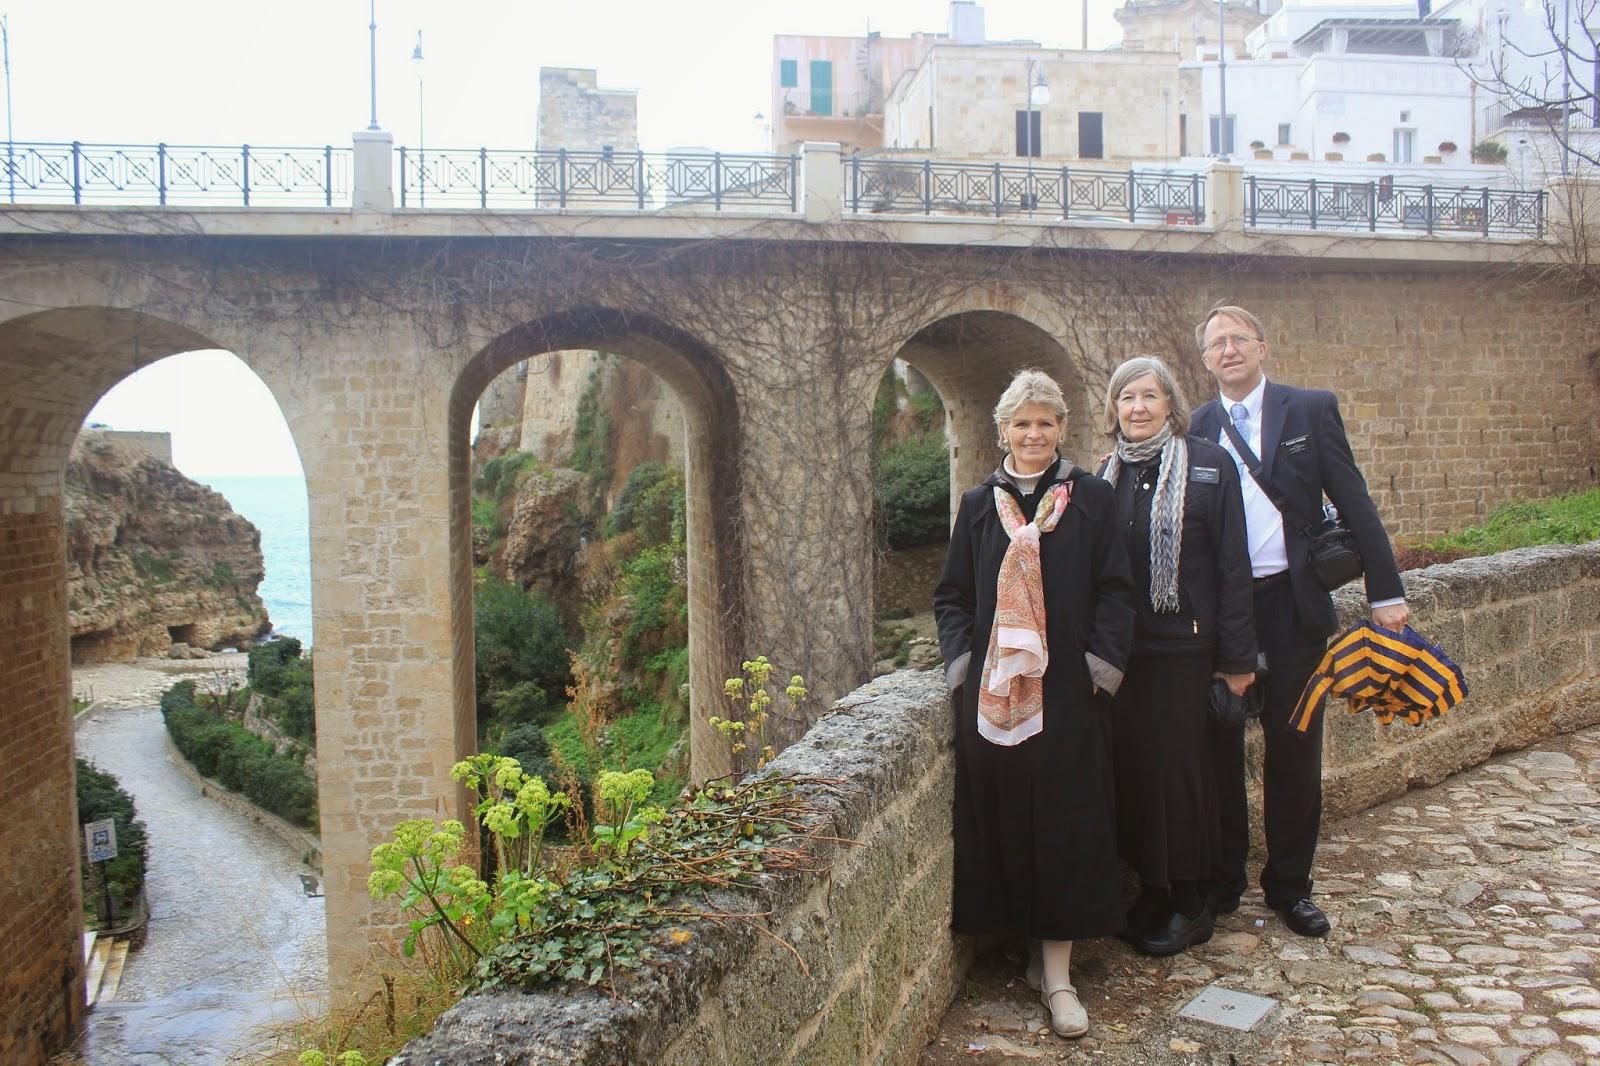 neapolis senior personals Senior care nursing homes best times to visit naples, italy neapolis festival (july) ferragosto (august.